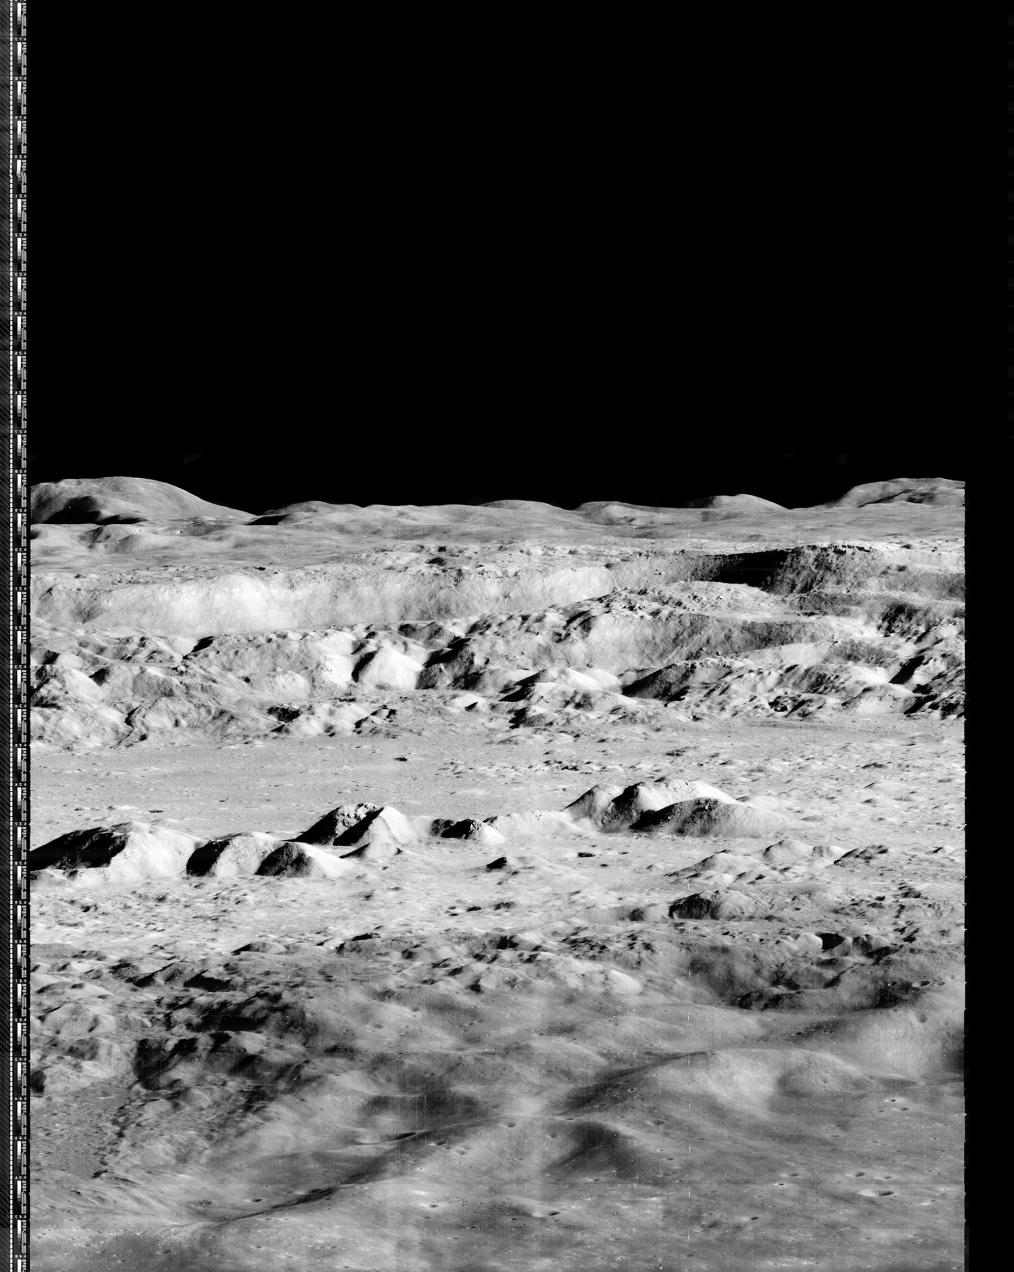 Lunar Orbiter II